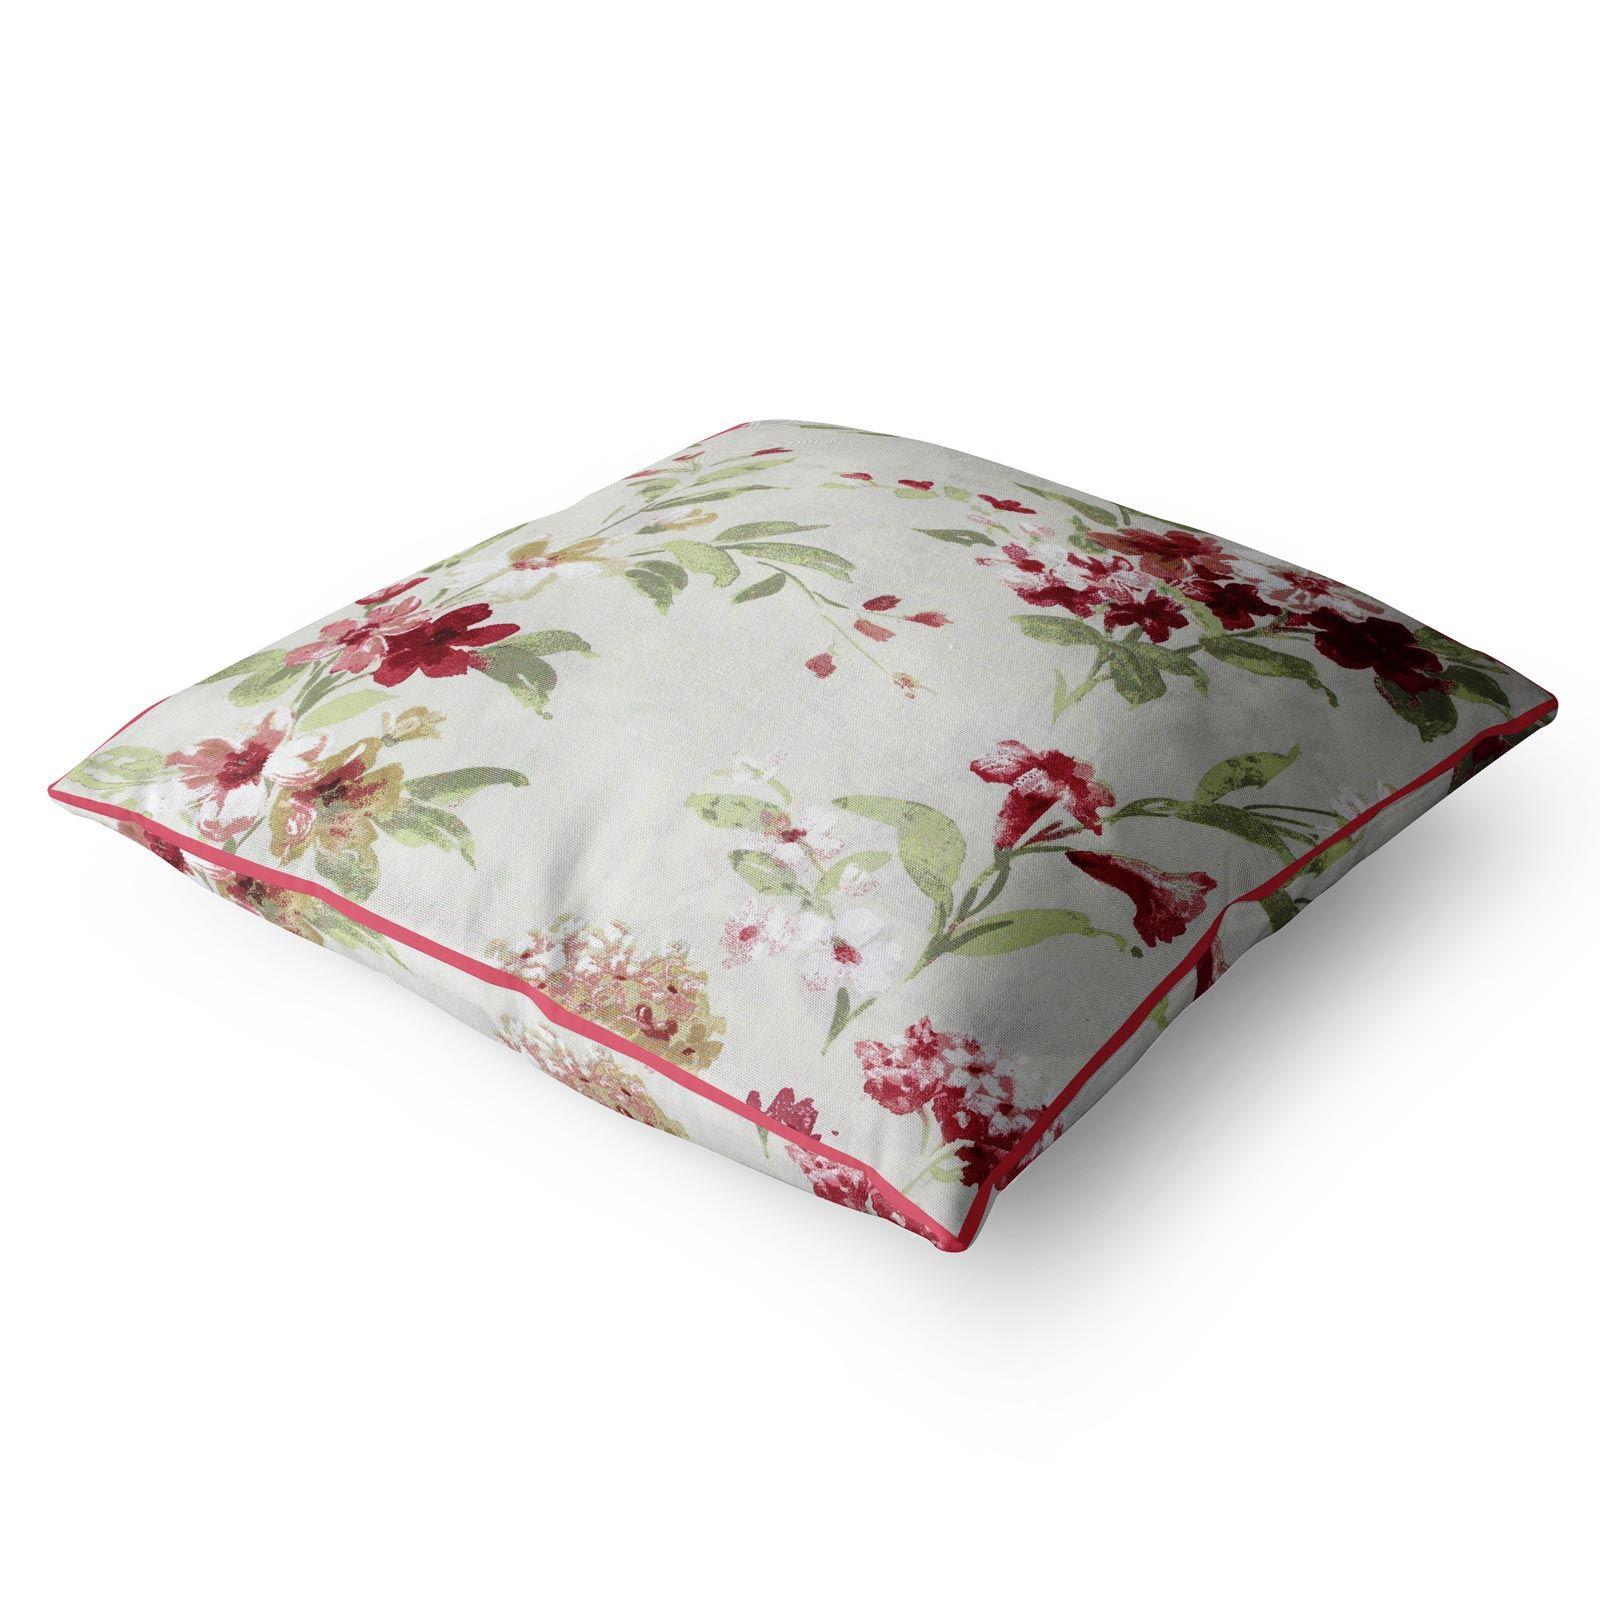 Vino-Tinto-Cushion-Covers-Coleccion-17-034-18-034-43cm-45cm-Cubierta miniatura 20